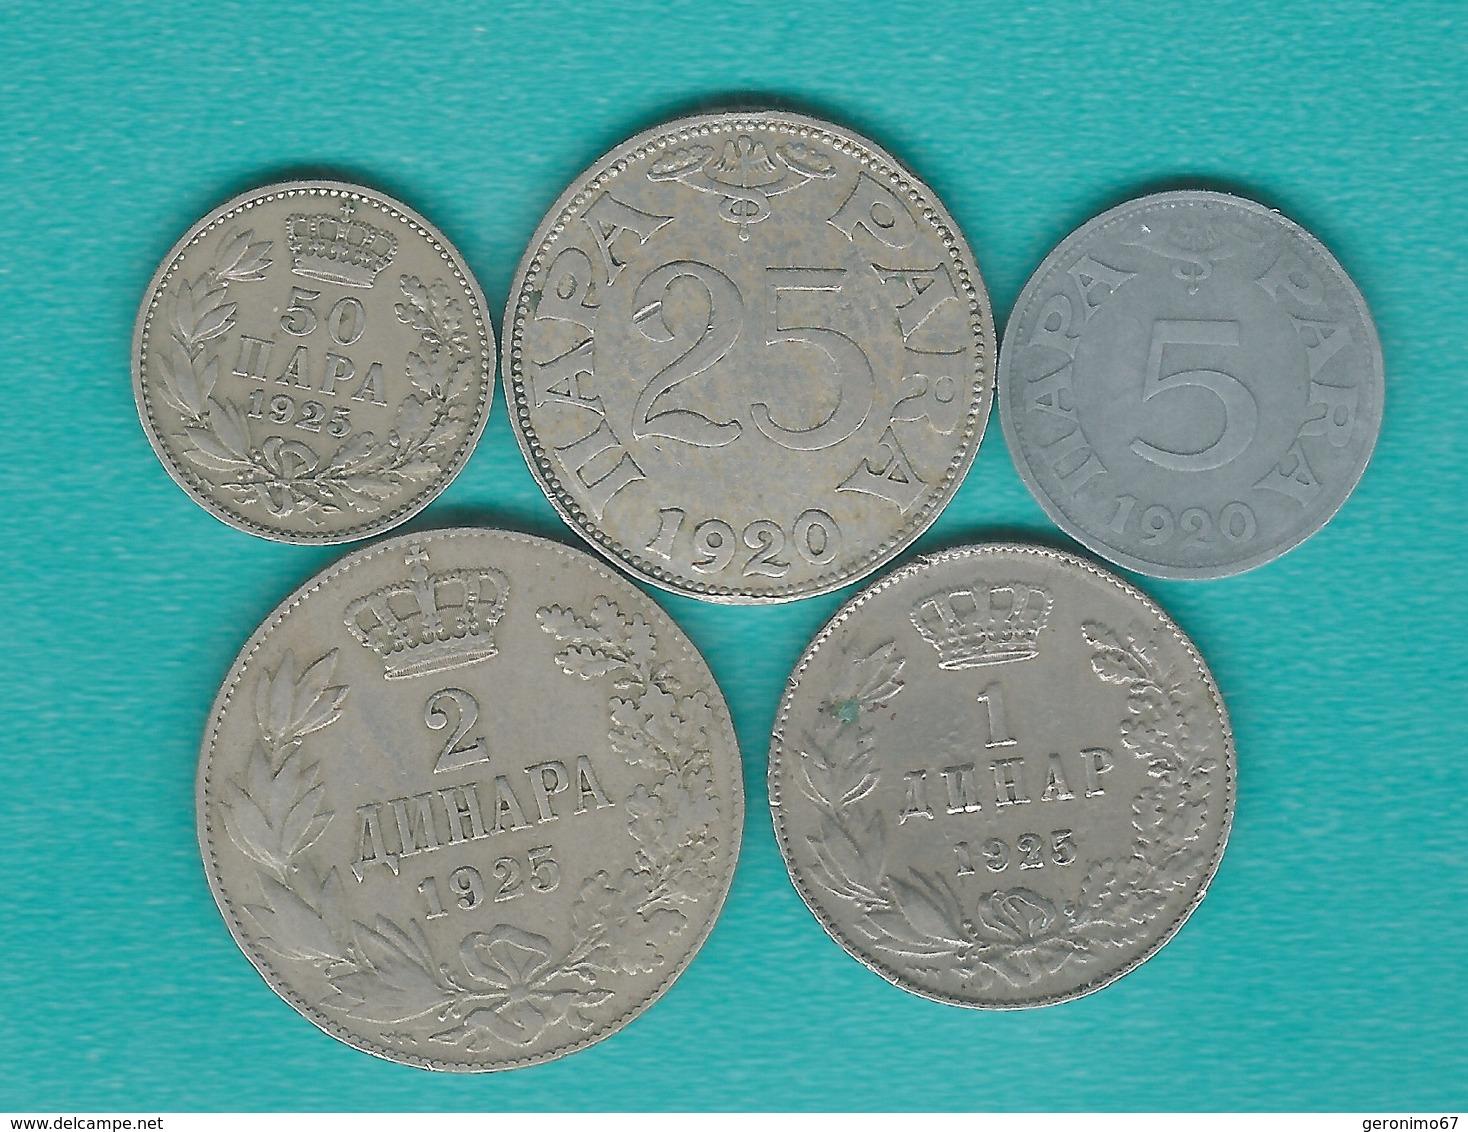 Kingdom Of Serbs, Croats & Slovenes - 1920 - 5 & 25 Para; 1925 - 50 Para, 1 & 2 Dinars (KMs 1, 3-6) - Serbie